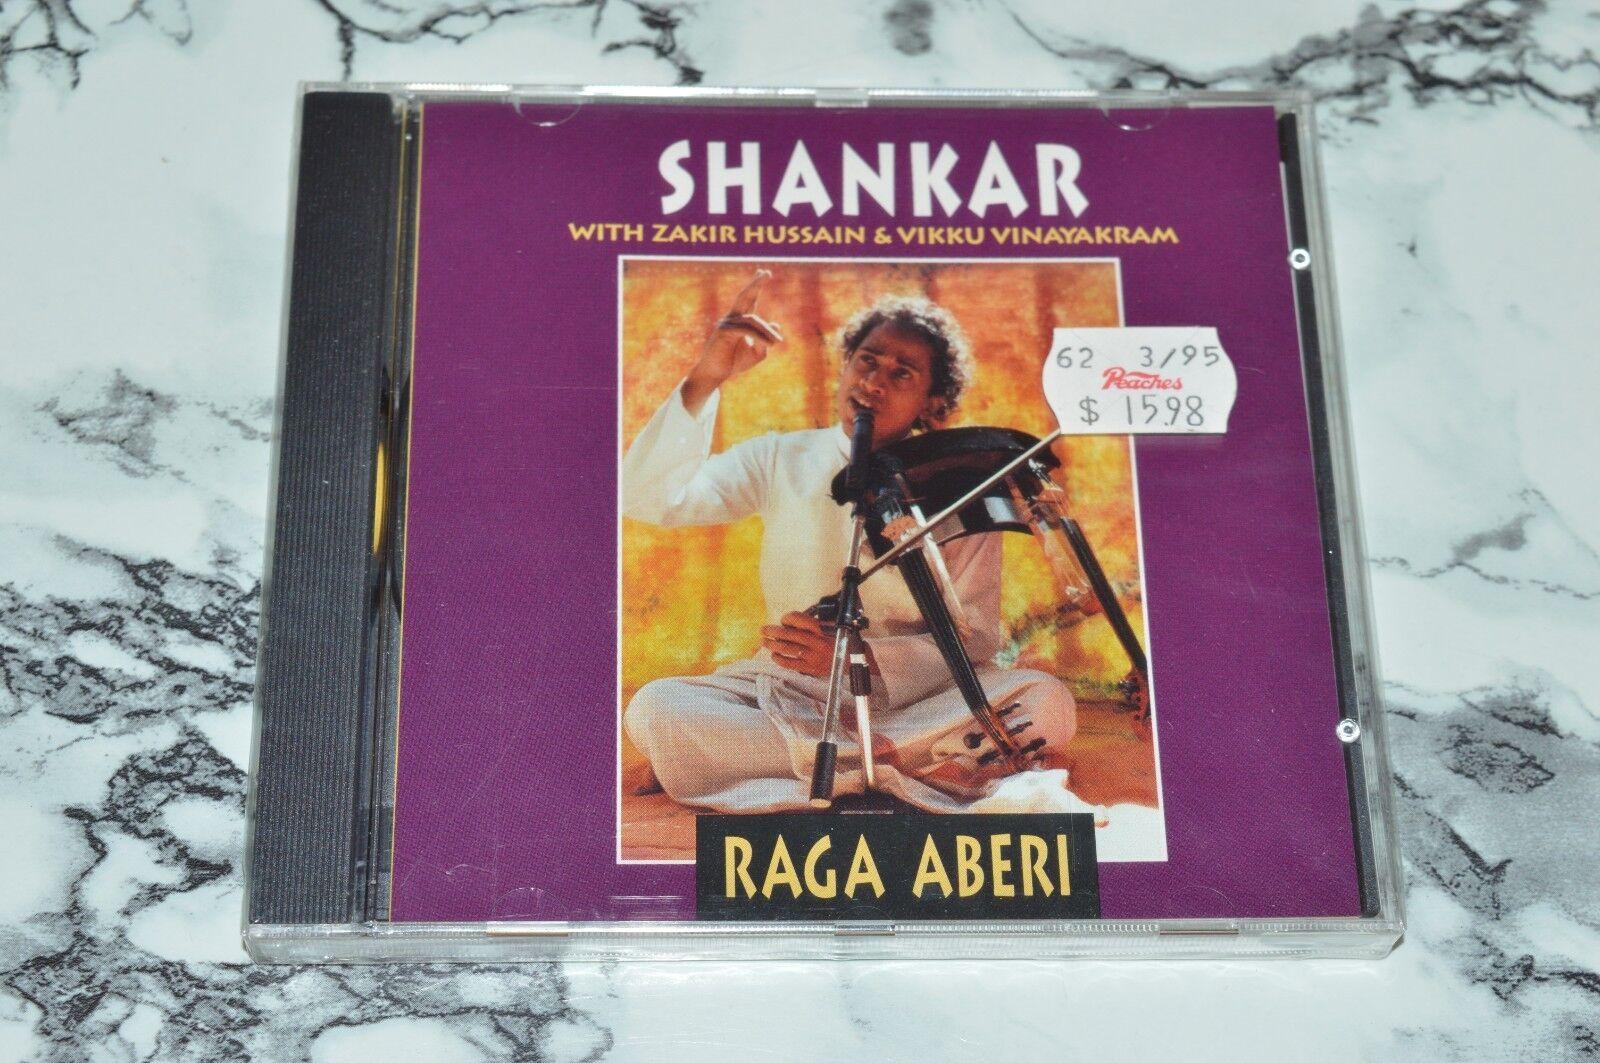 Raga Aberi by Shankar (CD, Mar-1995, Music Of The World)